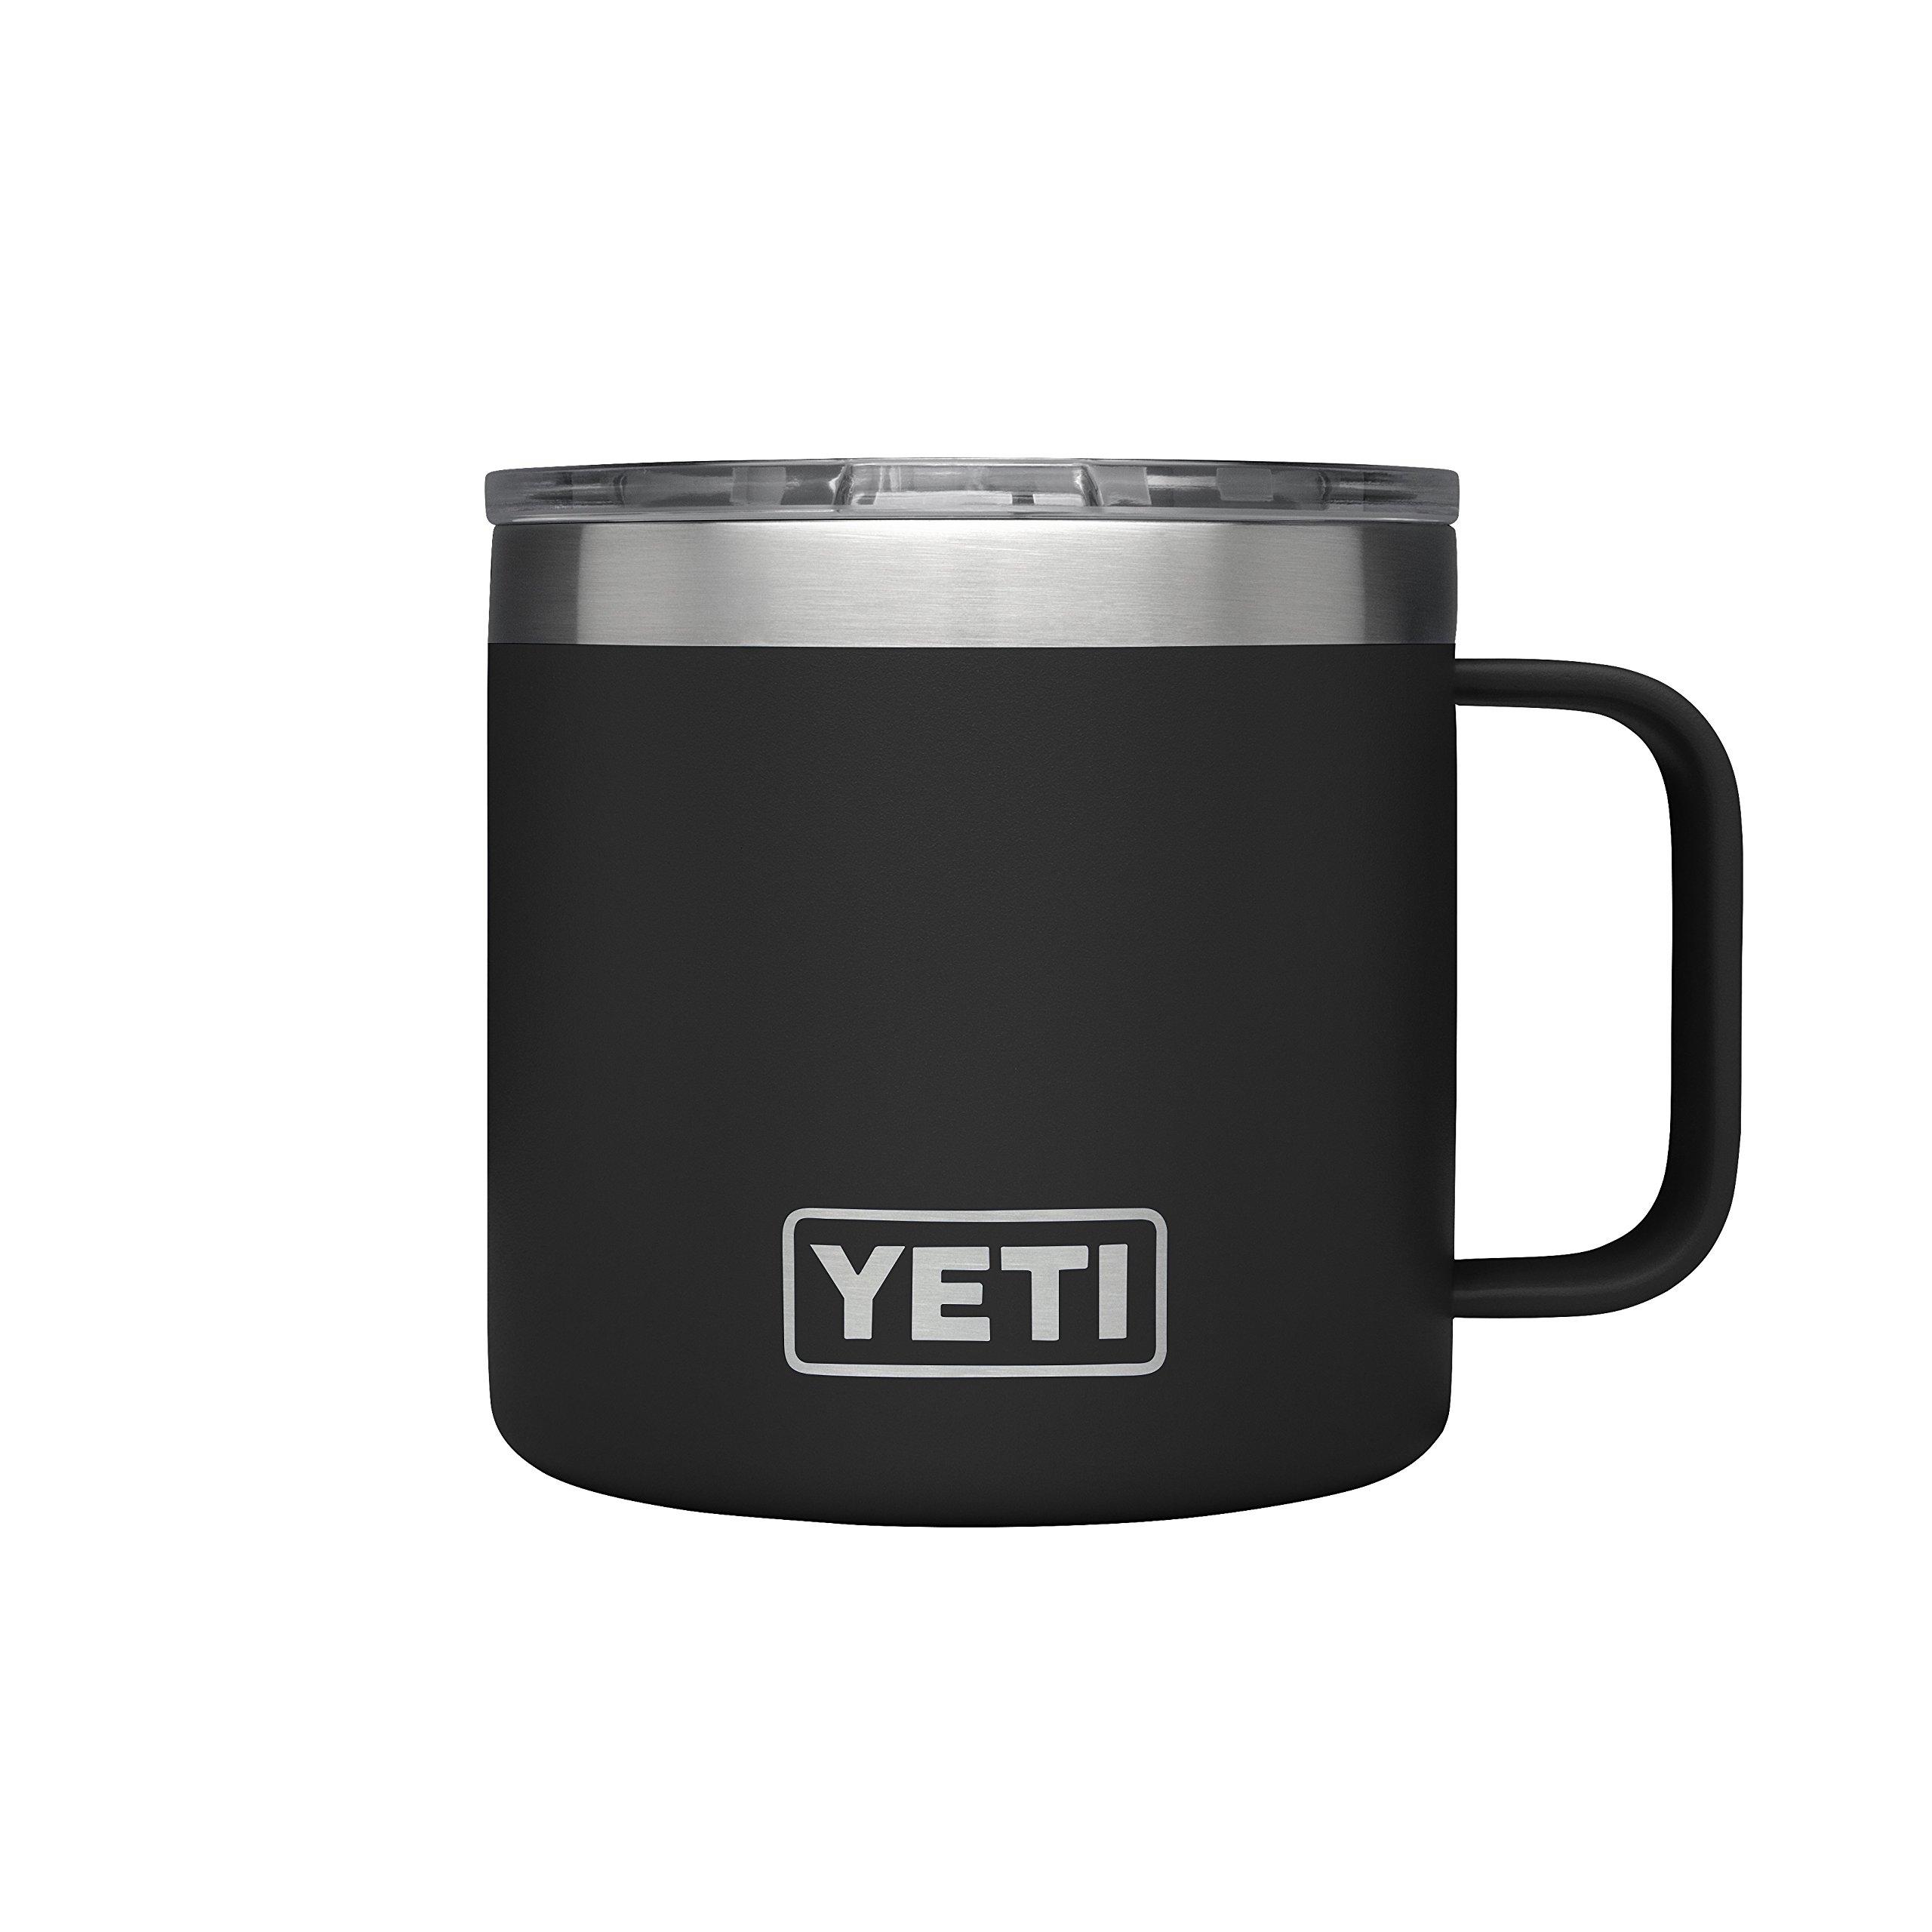 YETI Rambler 14 oz Stainless Steel Vacuum Insulated Mug with Lid, Black by YETI